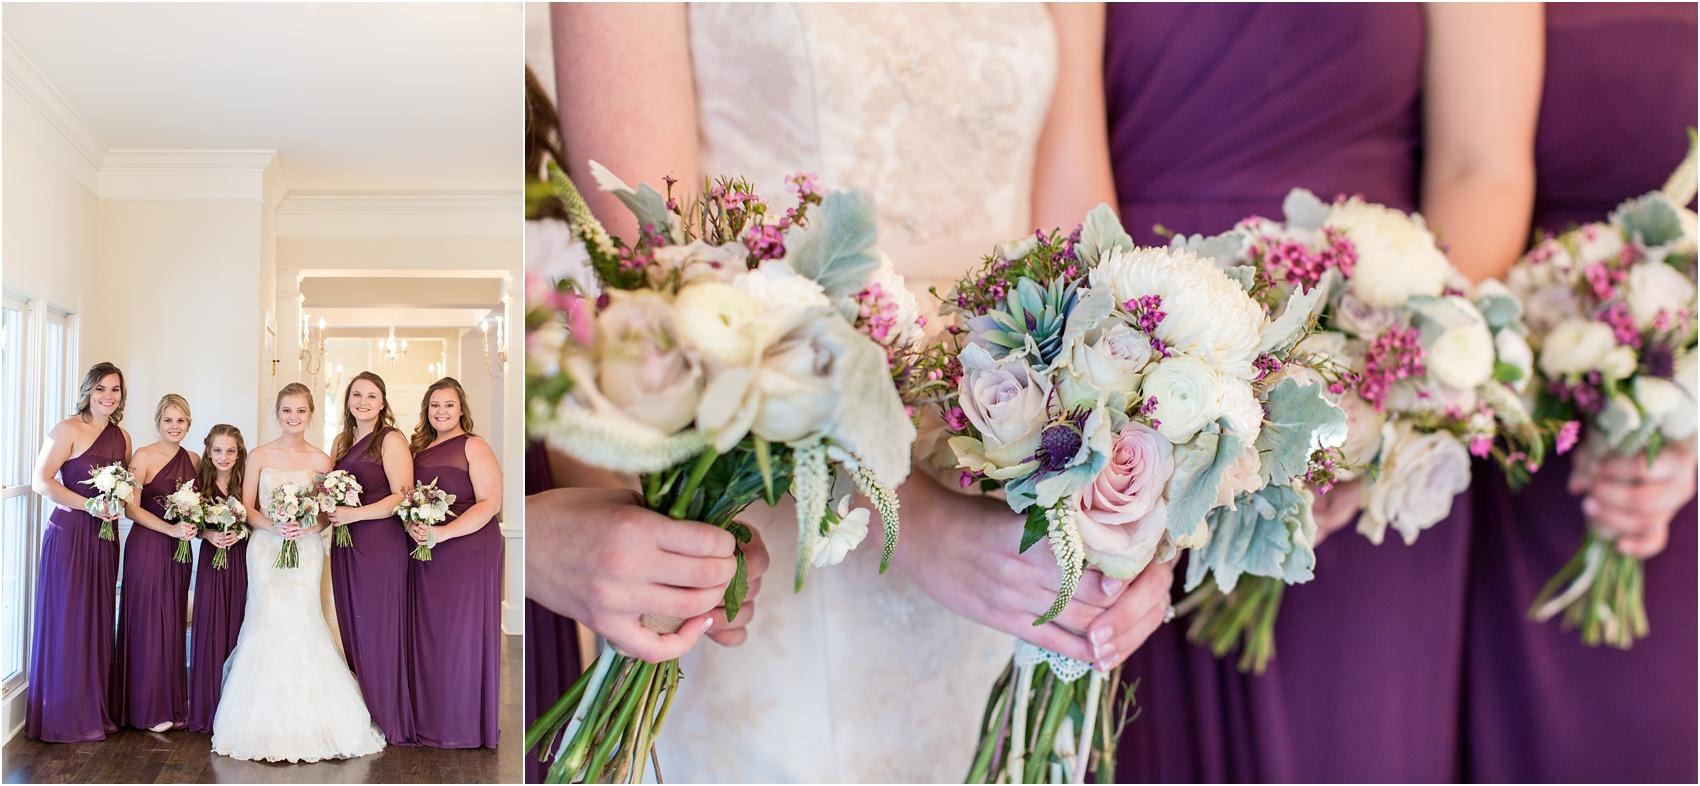 Savannah Eve Photography- Perkins Wedding- Blog-17.jpg